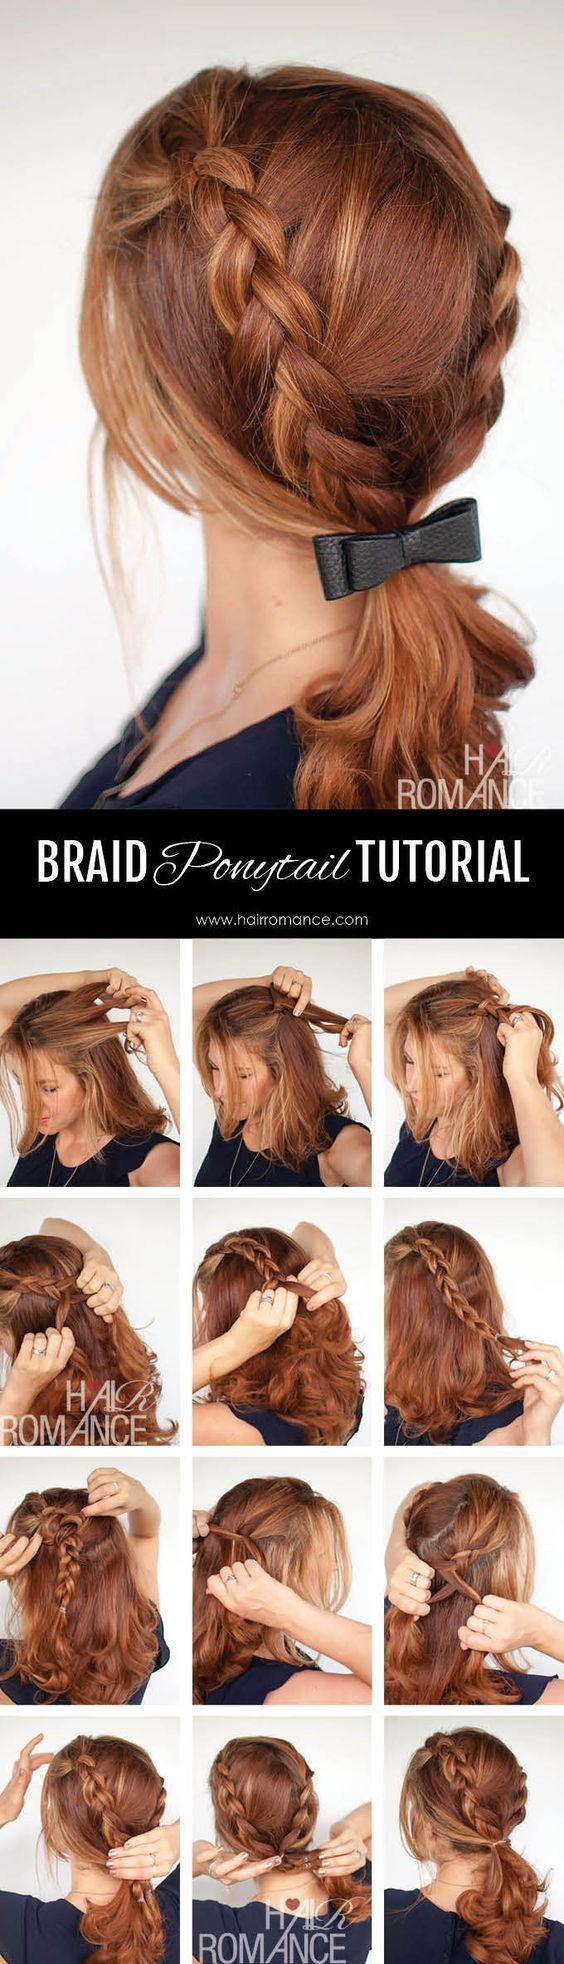 100 Super Easy DIY Braided Hairstyles for Wedding Tutorials: